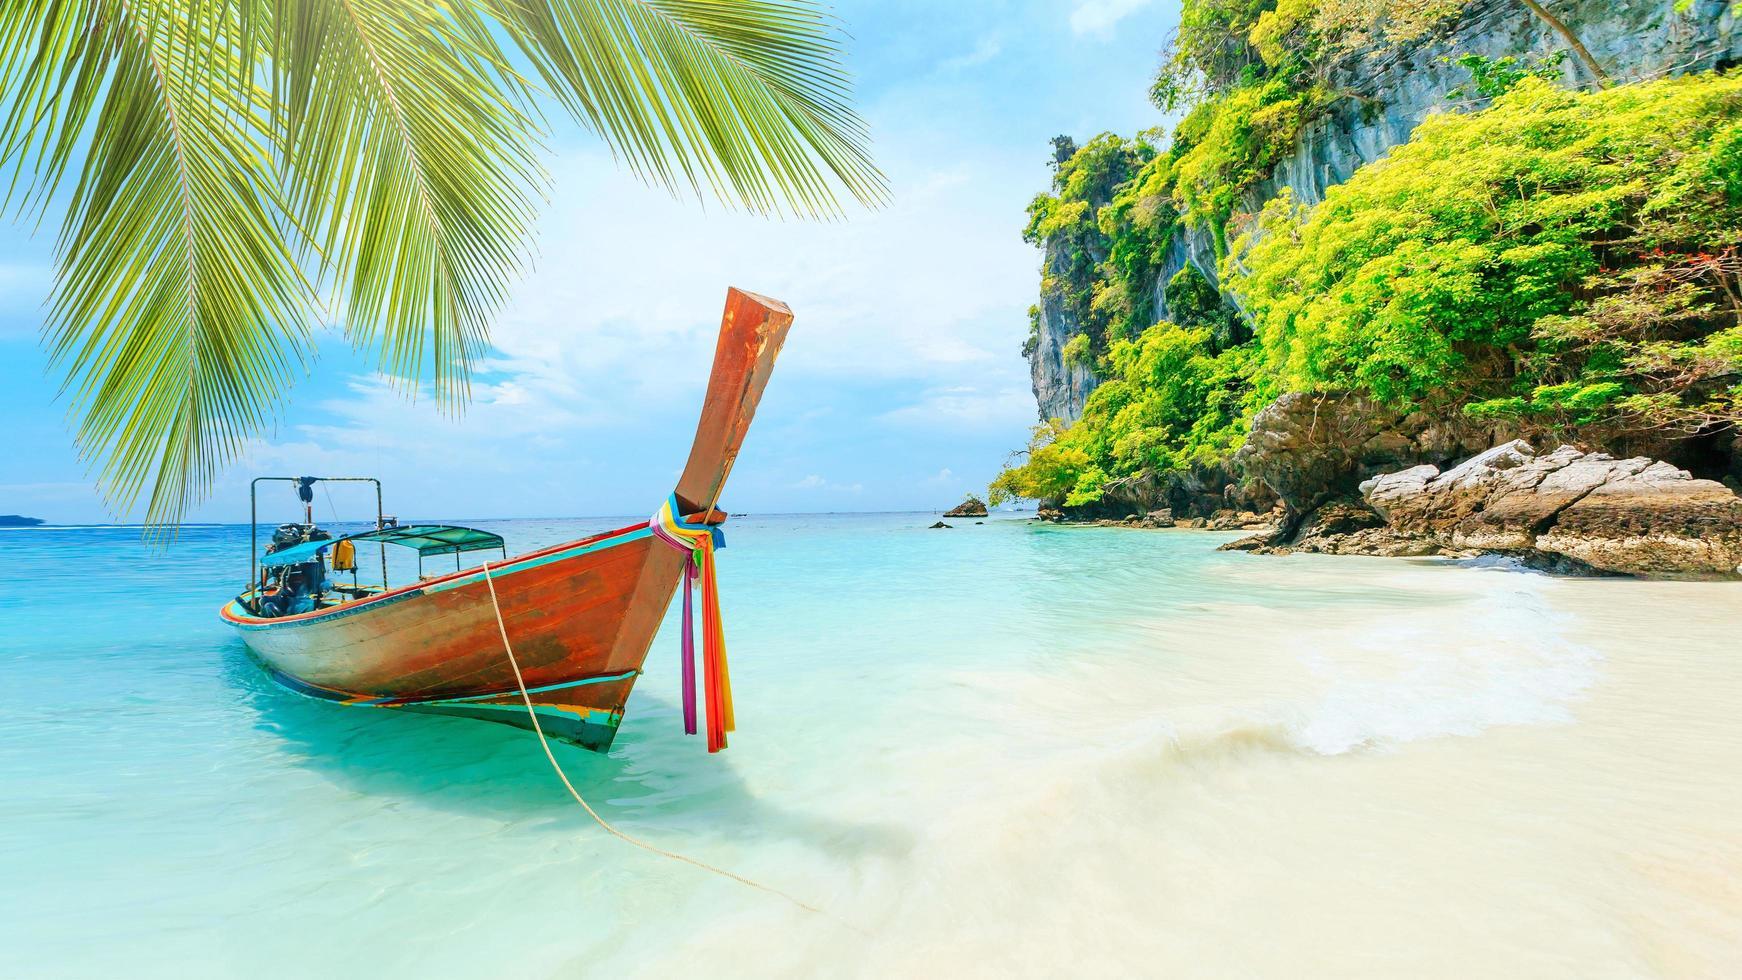 lang verhaal boot op wit strand in phuket, thailand foto